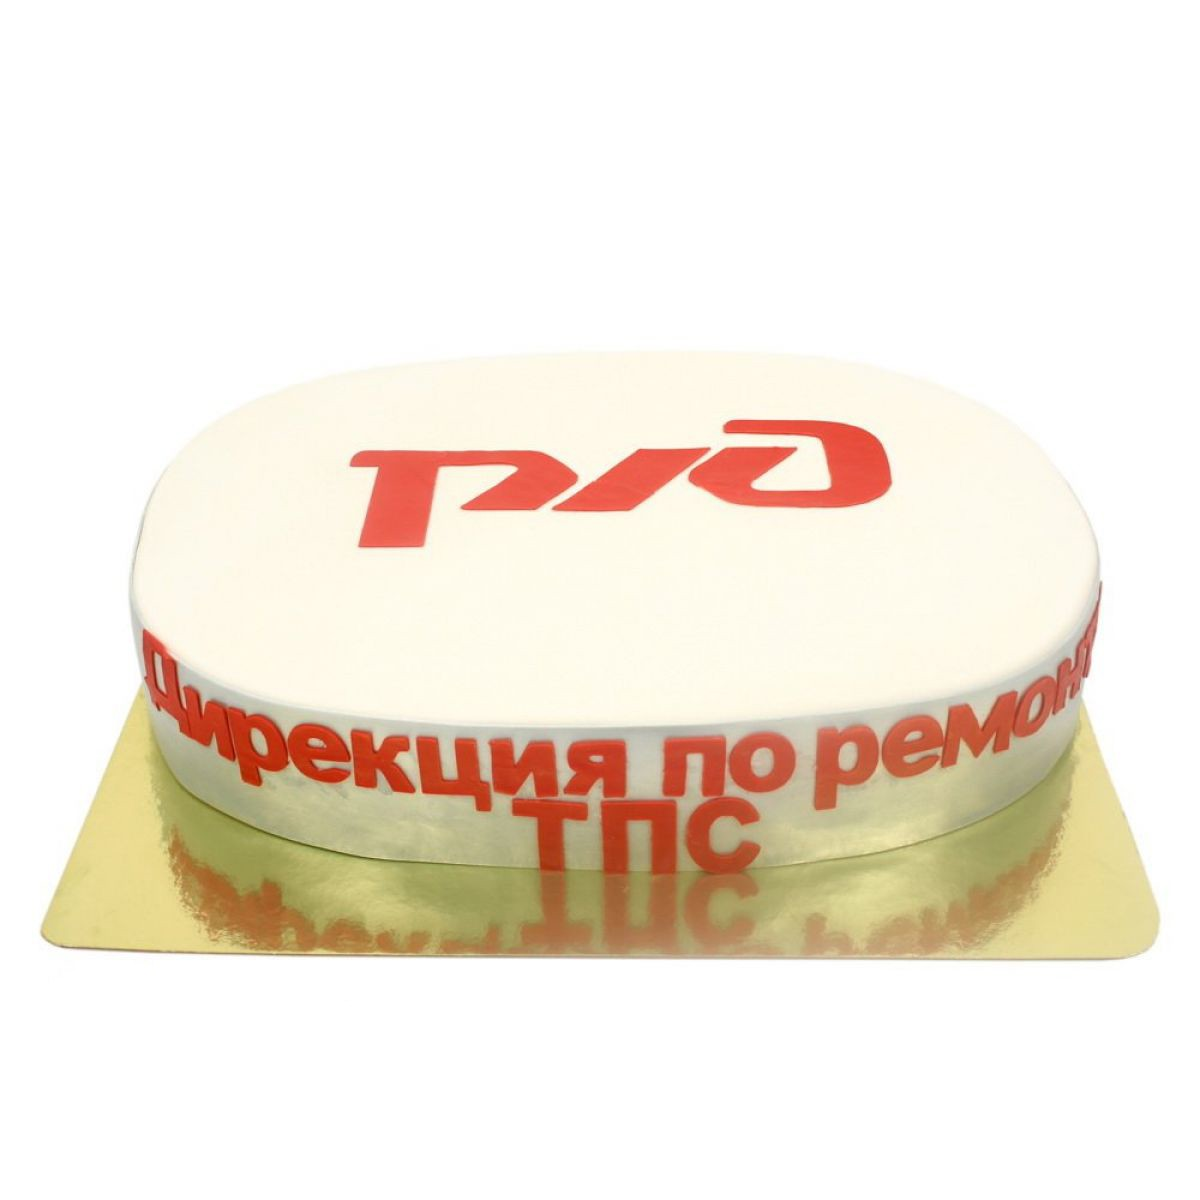 №1073 Торт ржд